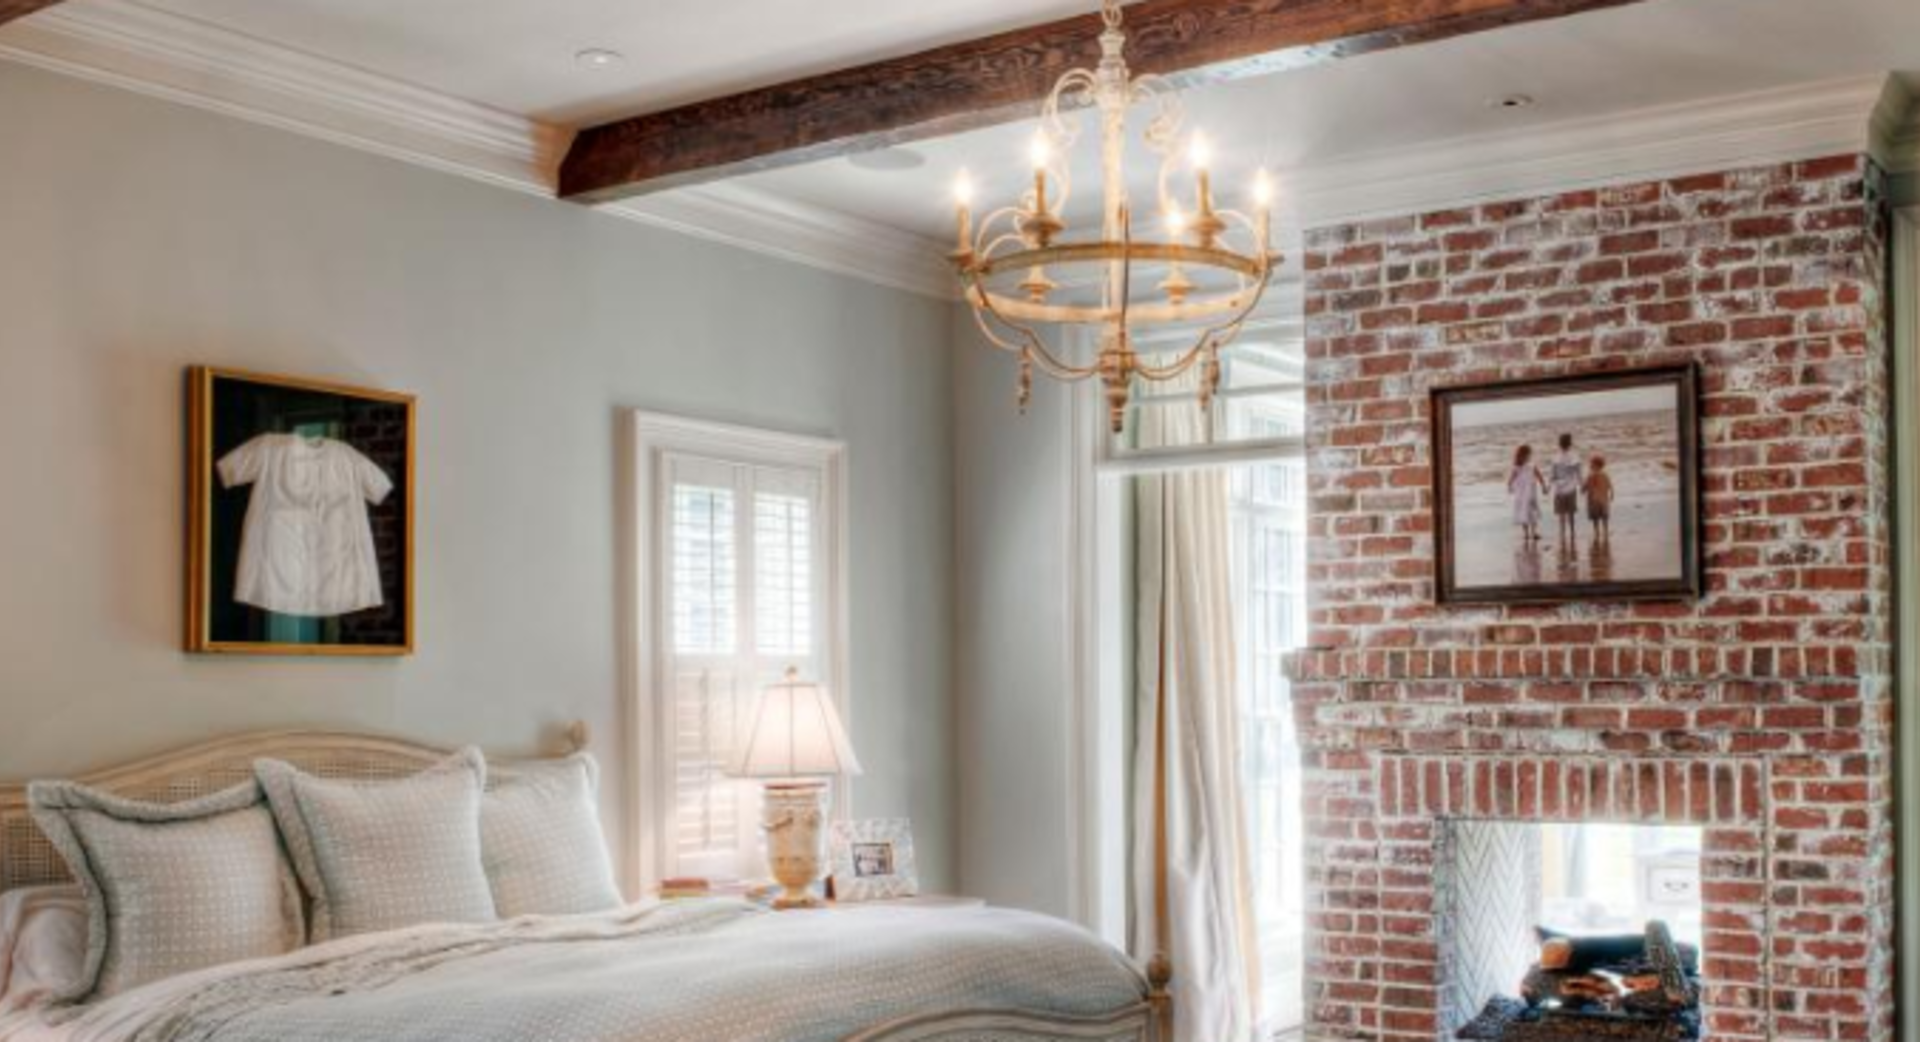 Does Your Home Design Spark Joy?